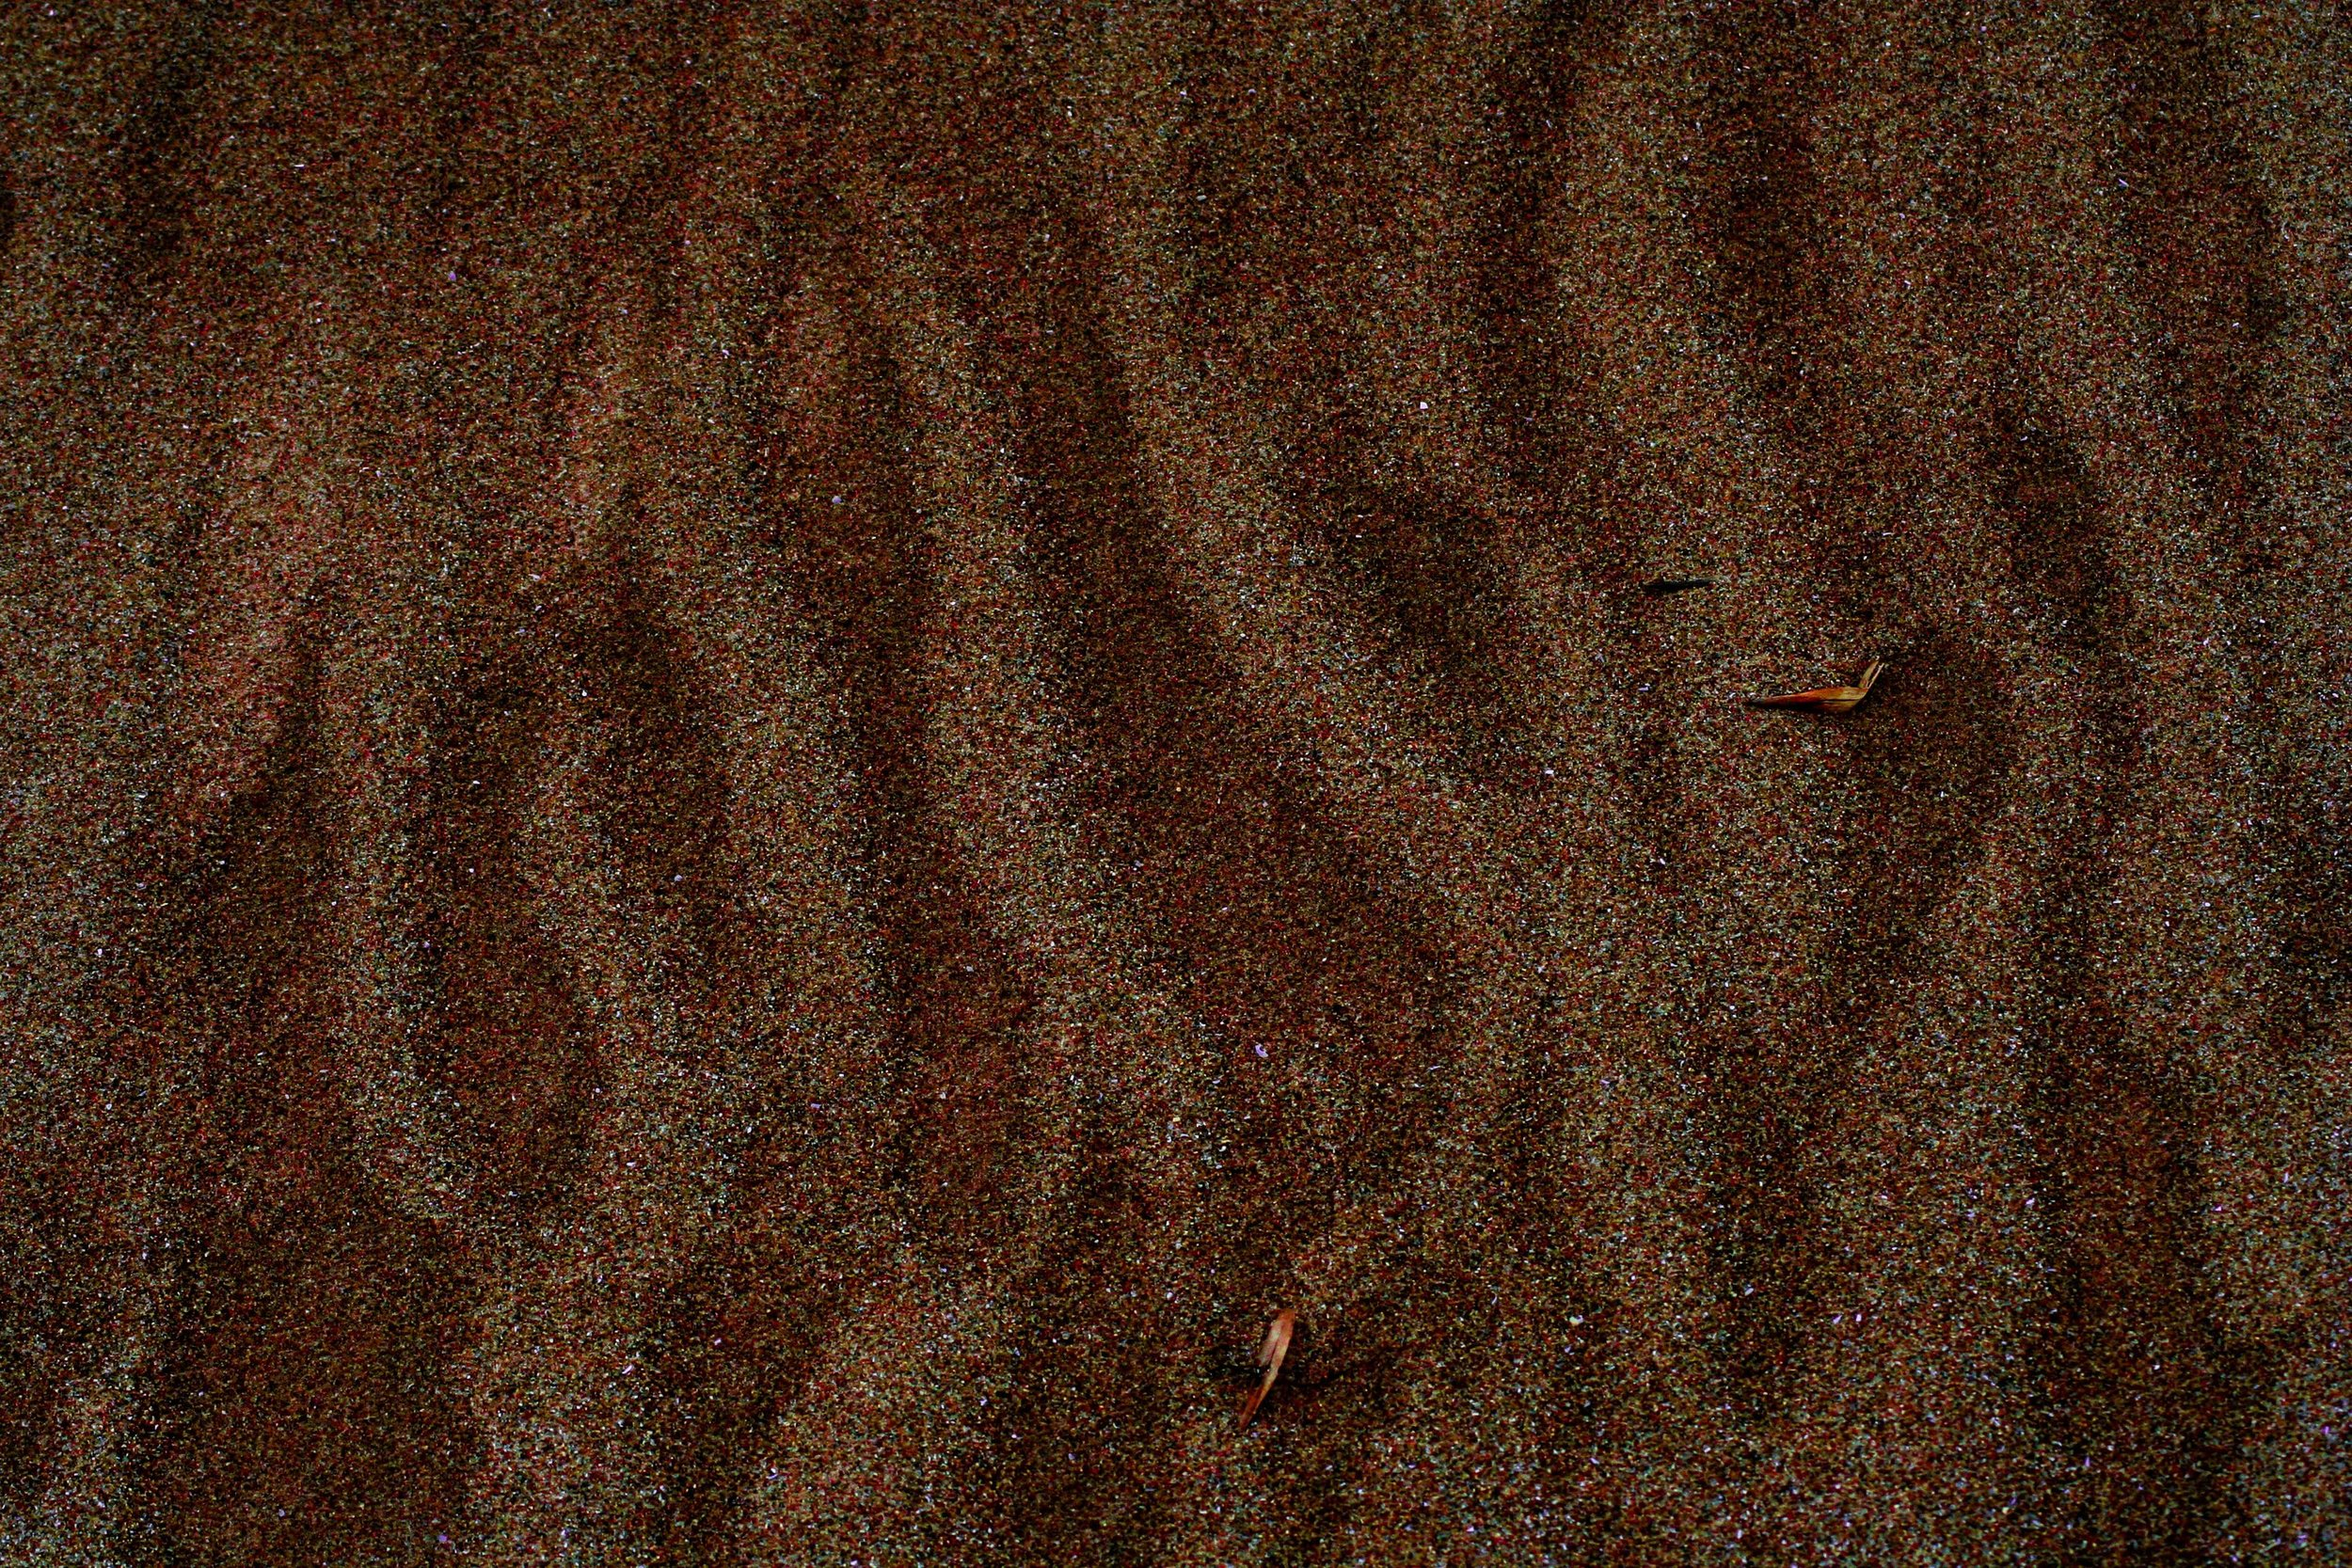 sand 2-min.jpg